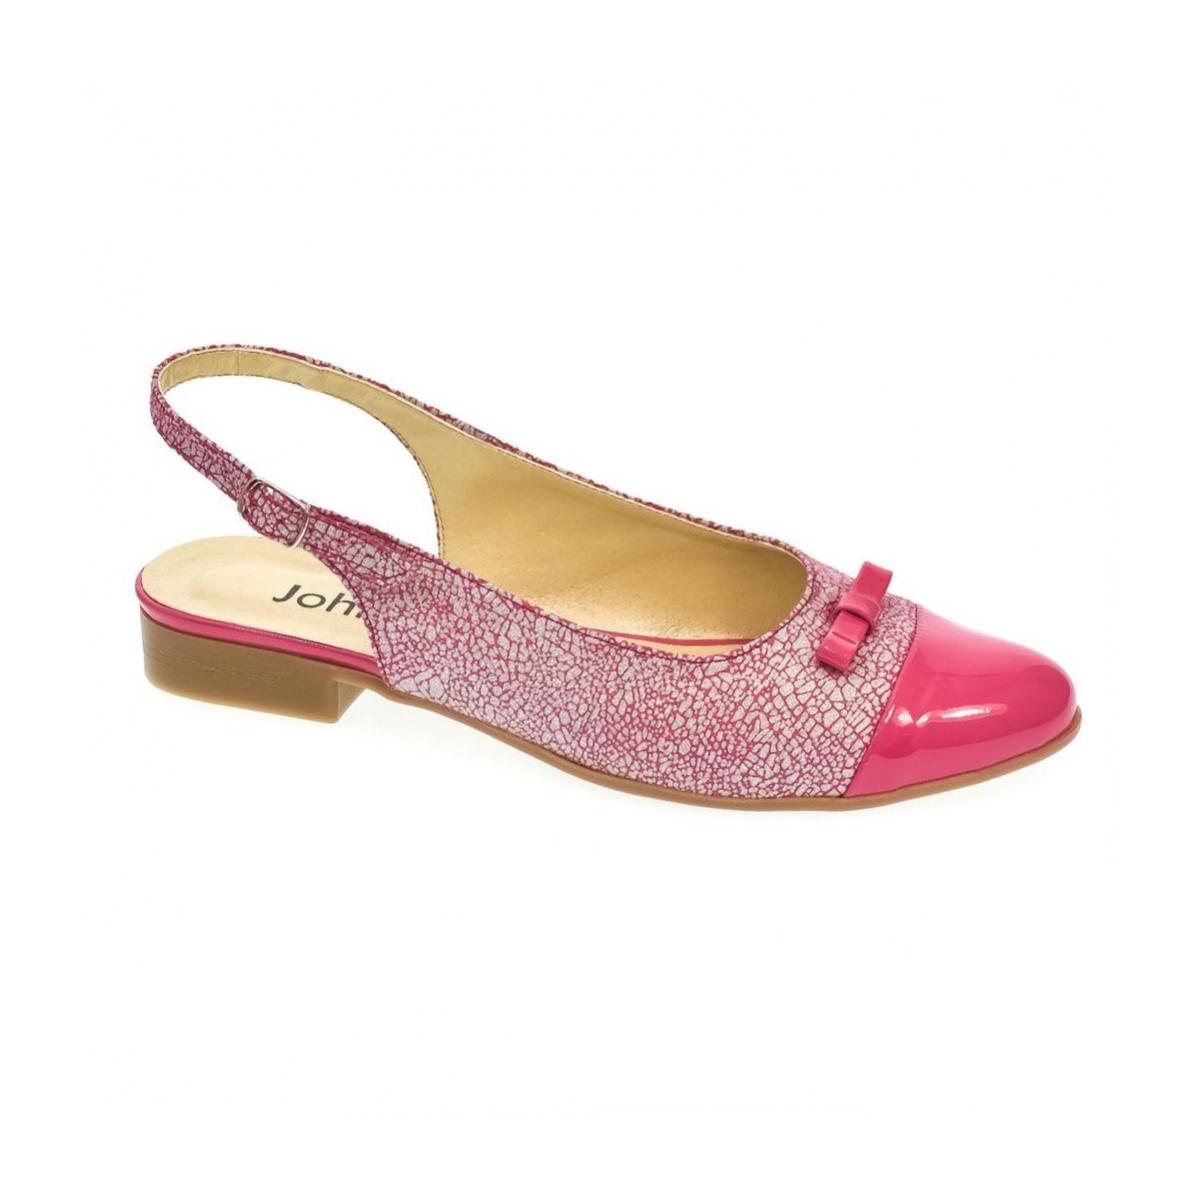 22d4b54f9595b Dámske ružové sandále EVELINE | Johnc.sk